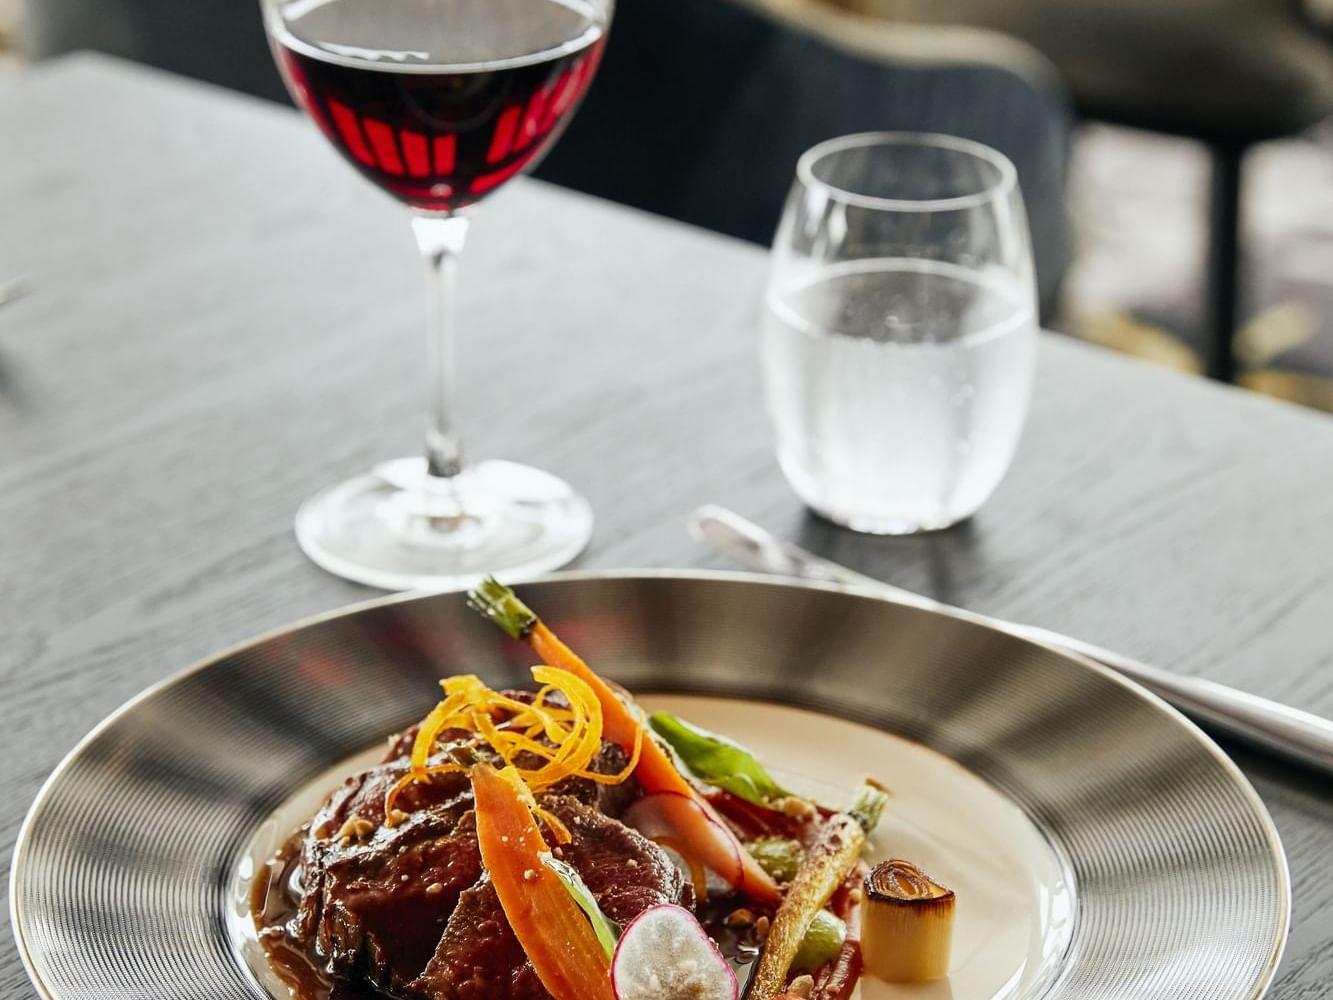 Wagyu Beef in Infinity Restaurant at Daydream Island Resort